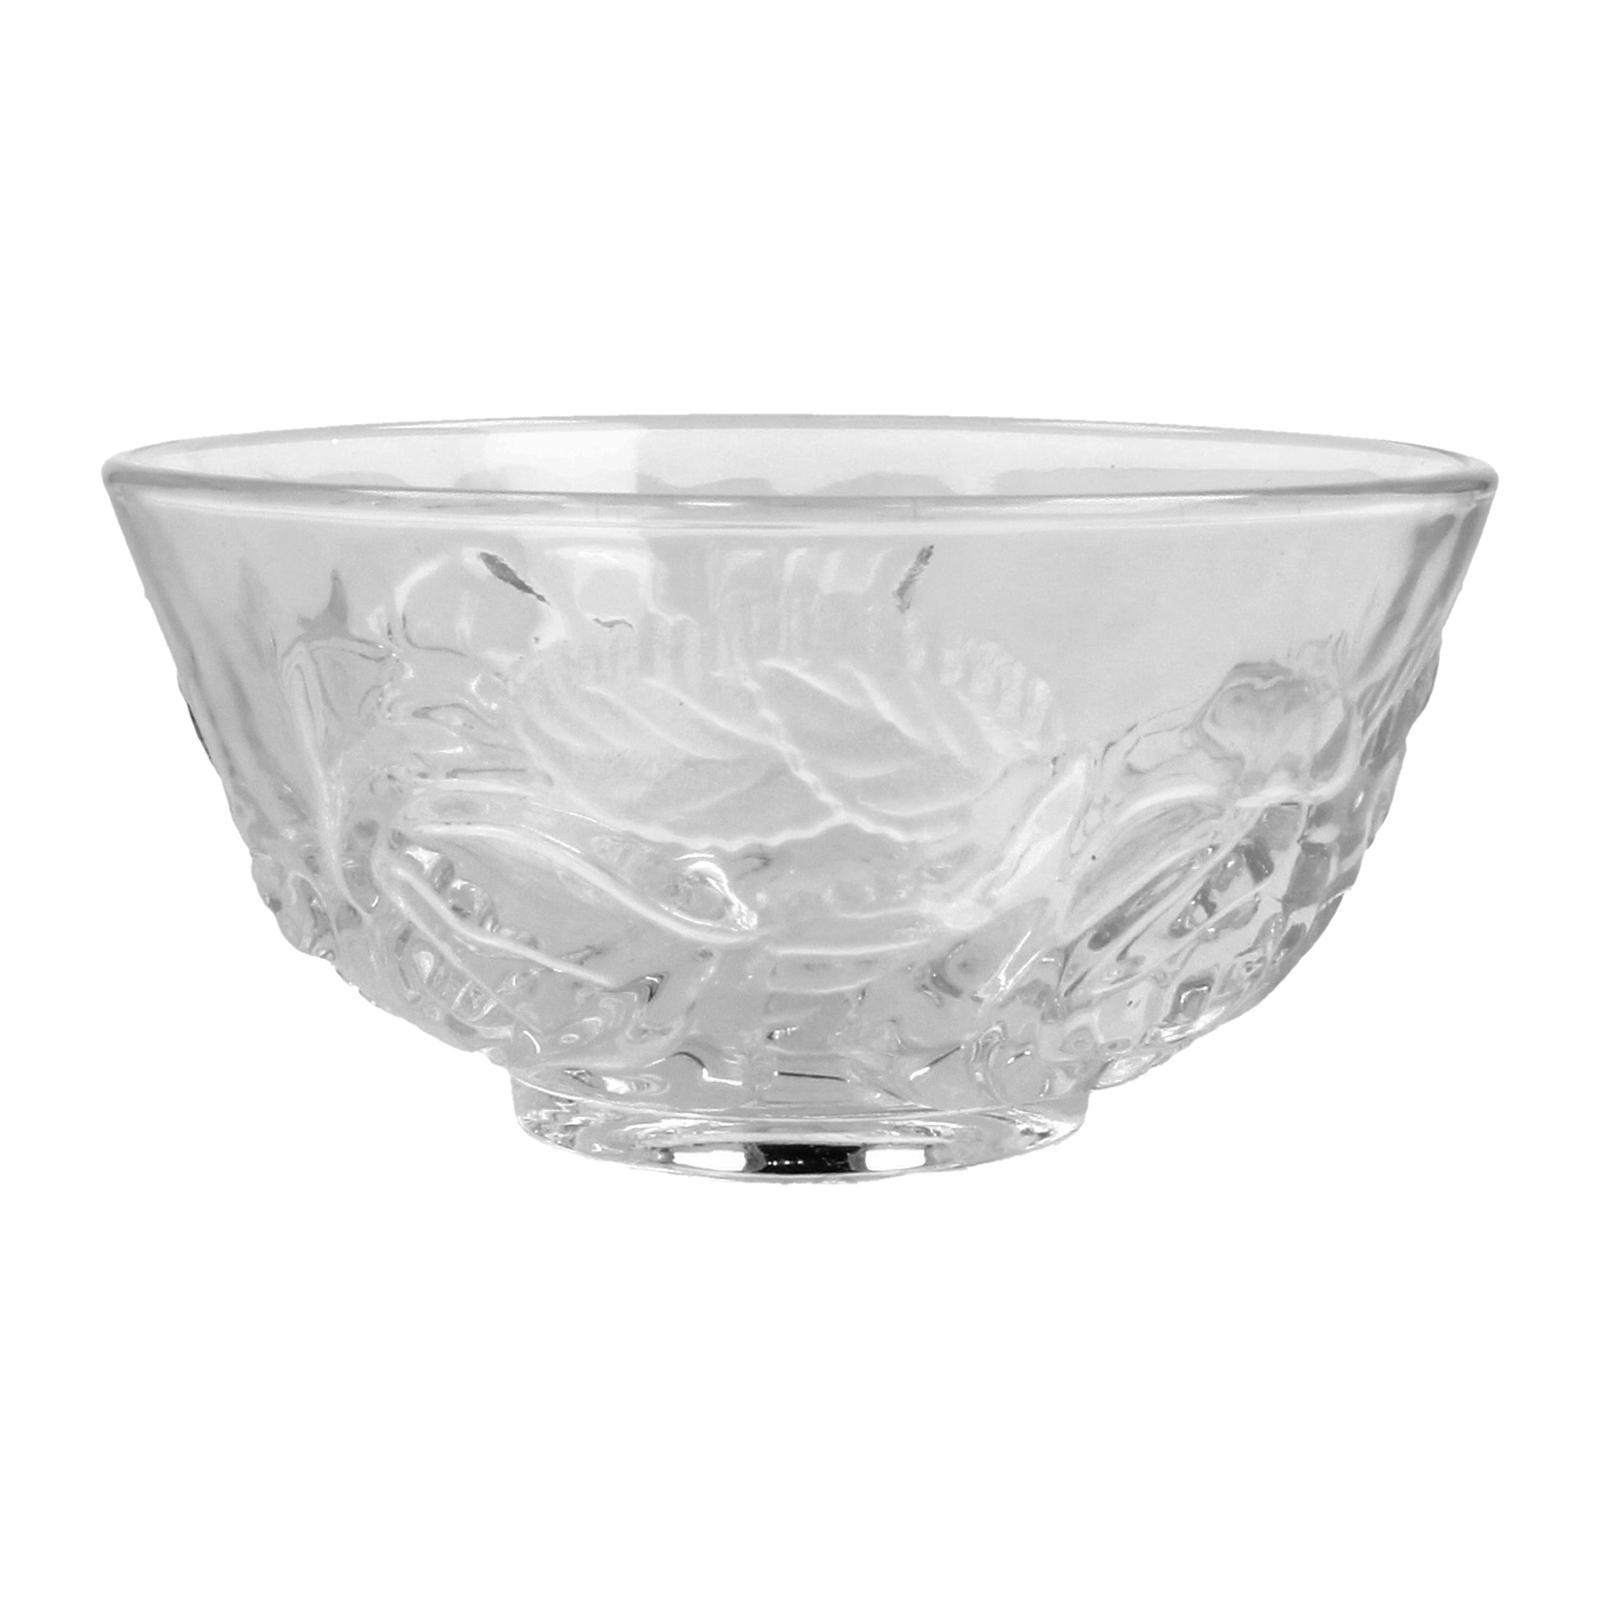 Soga Mid Winter Glass Bowl 3.75